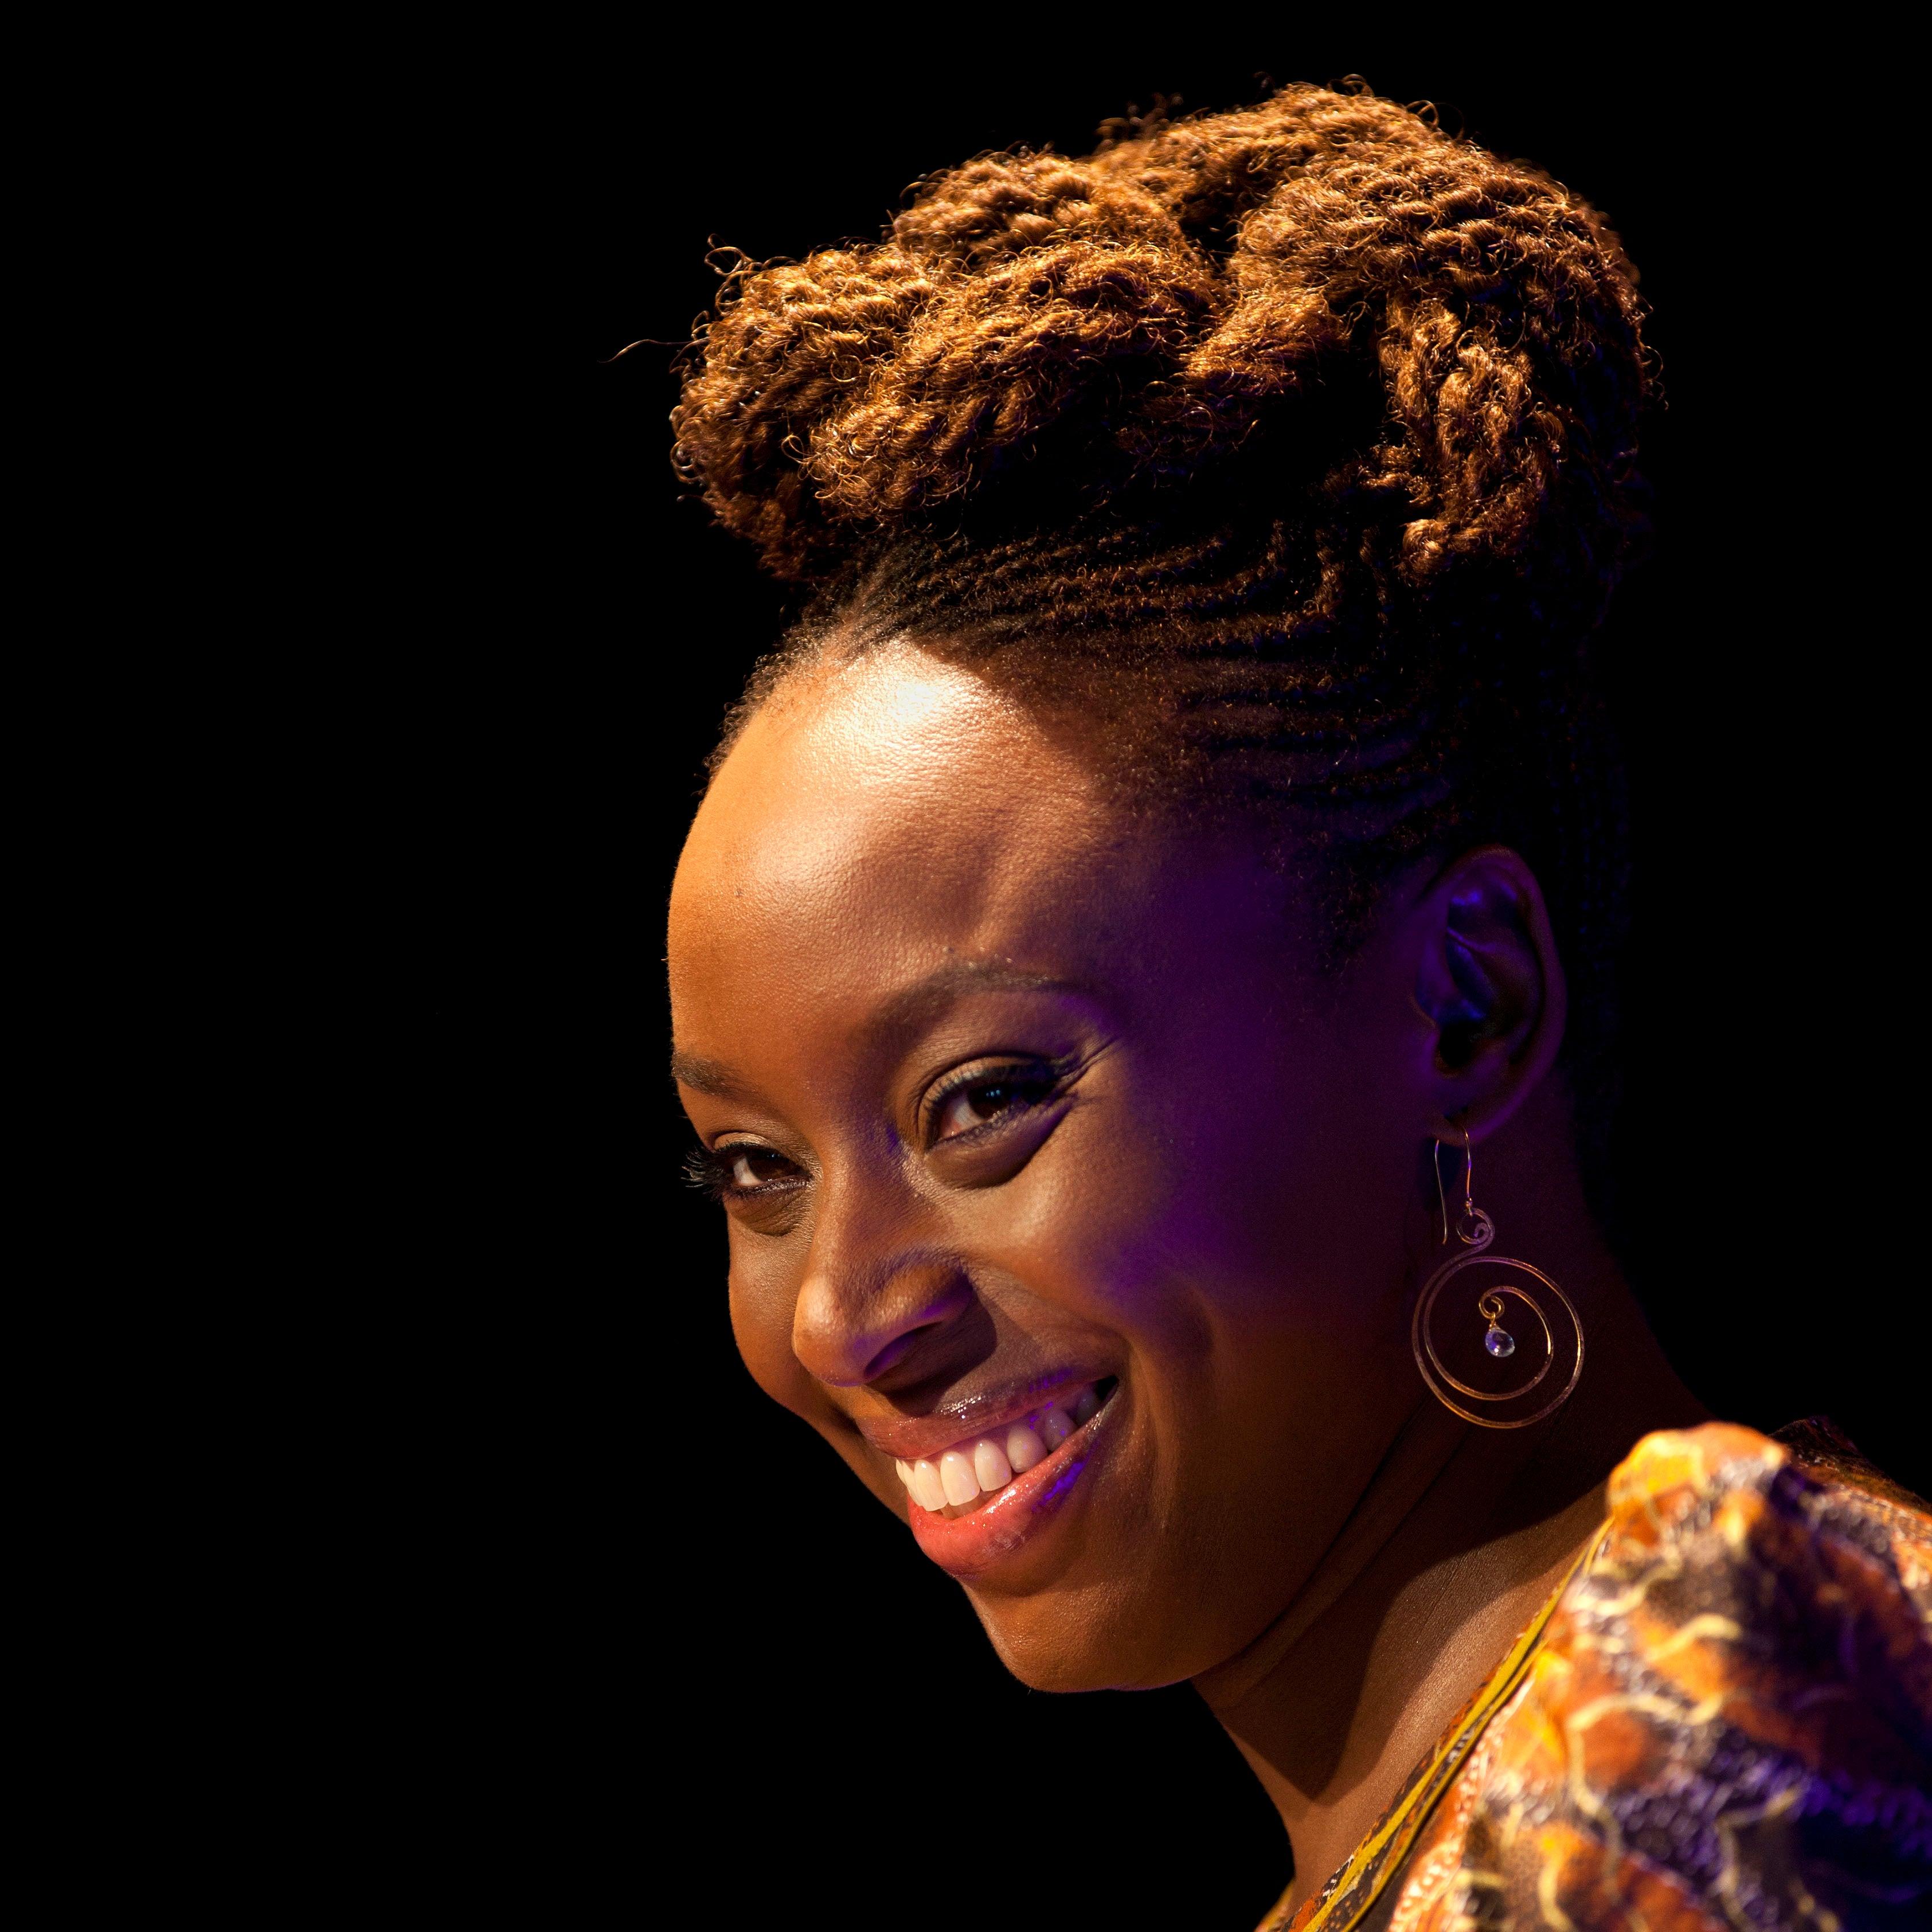 Emerging Director Imagines Concept Trailer For Chimamanda Ngozi Adichie's 'Americanah'